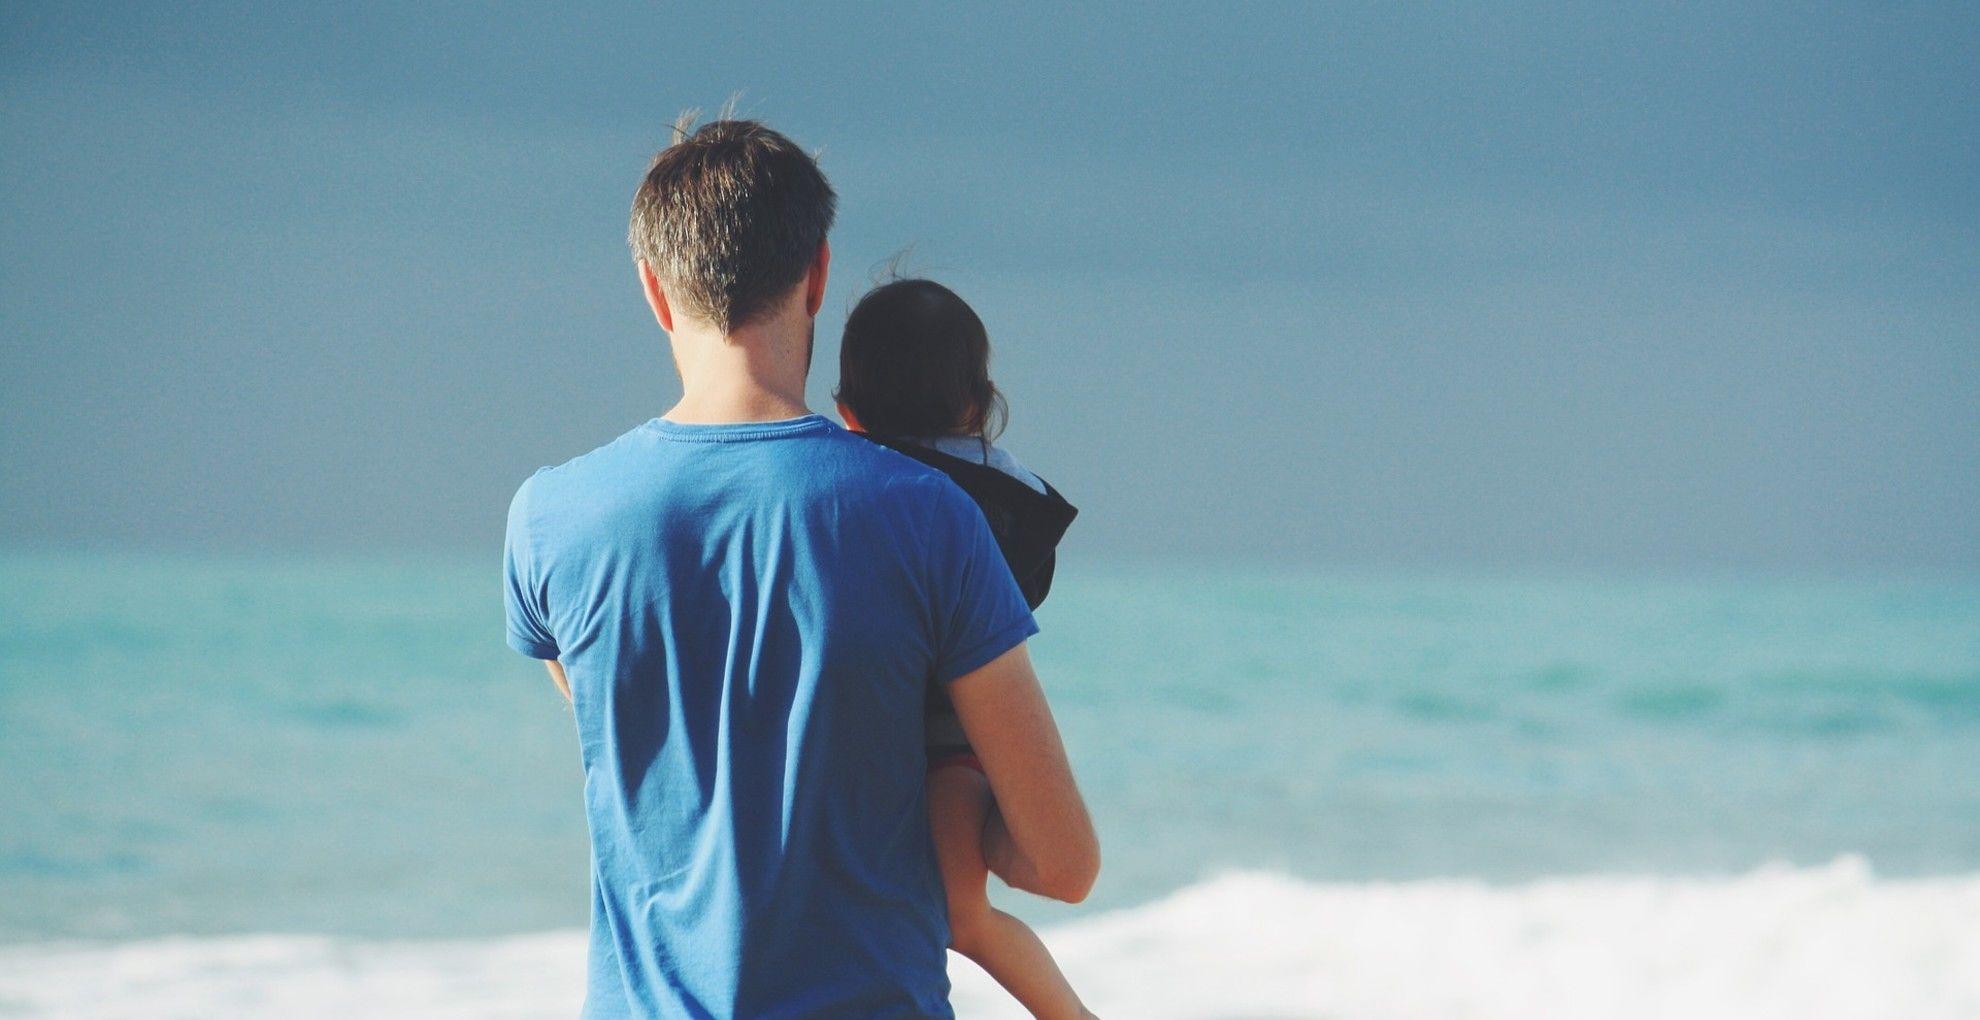 10 fontos tanács, amit aputól kaptam